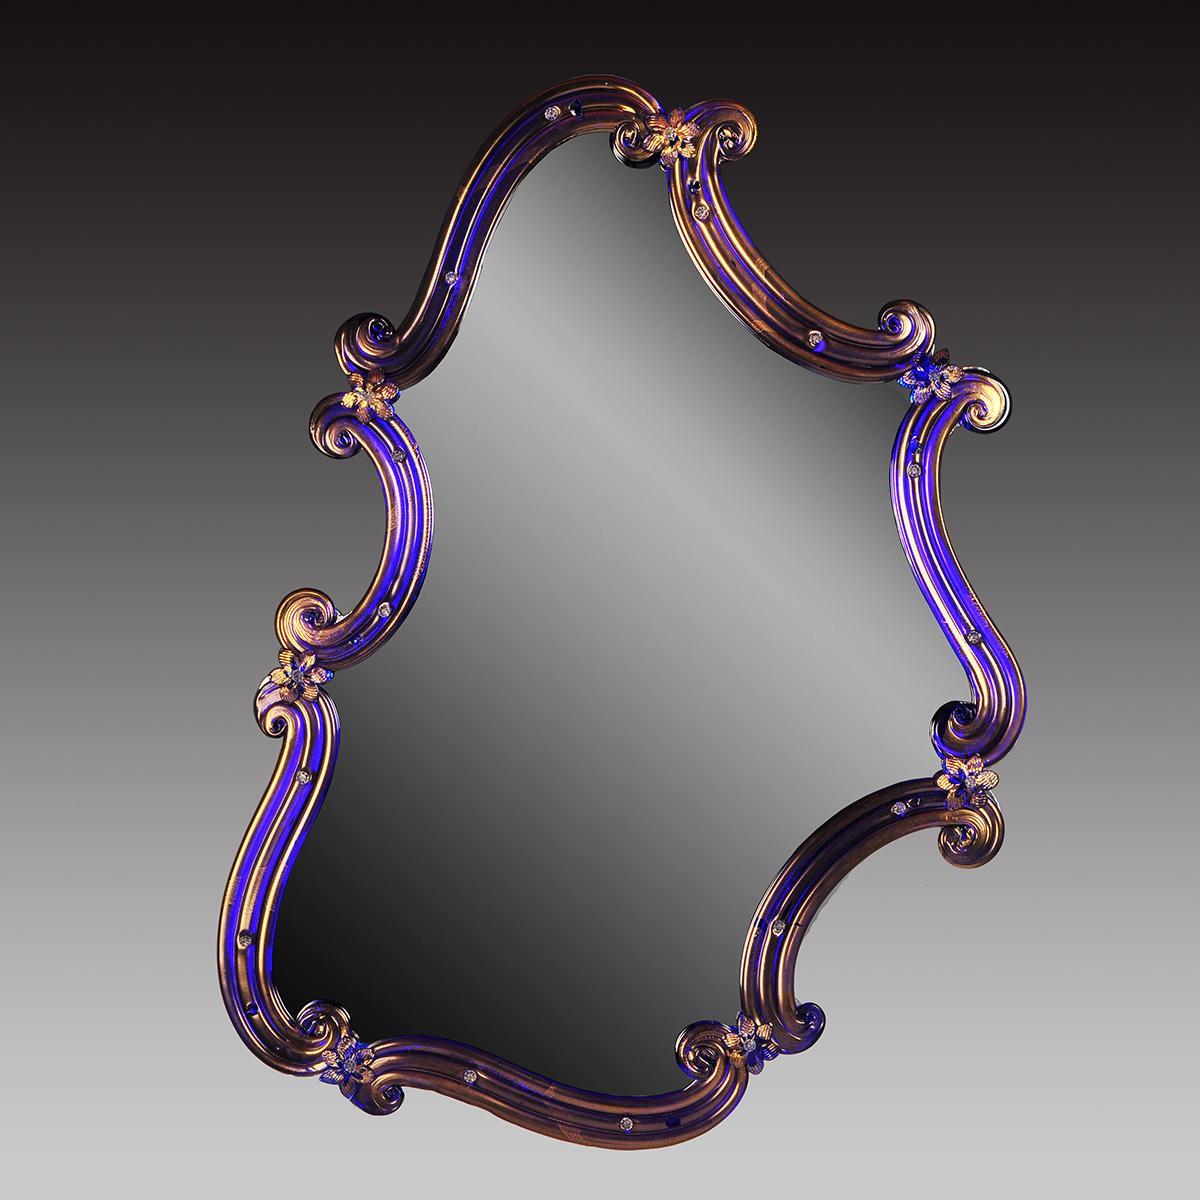 """Rosmunda blu"" Murano glass venetian mirror - blue"